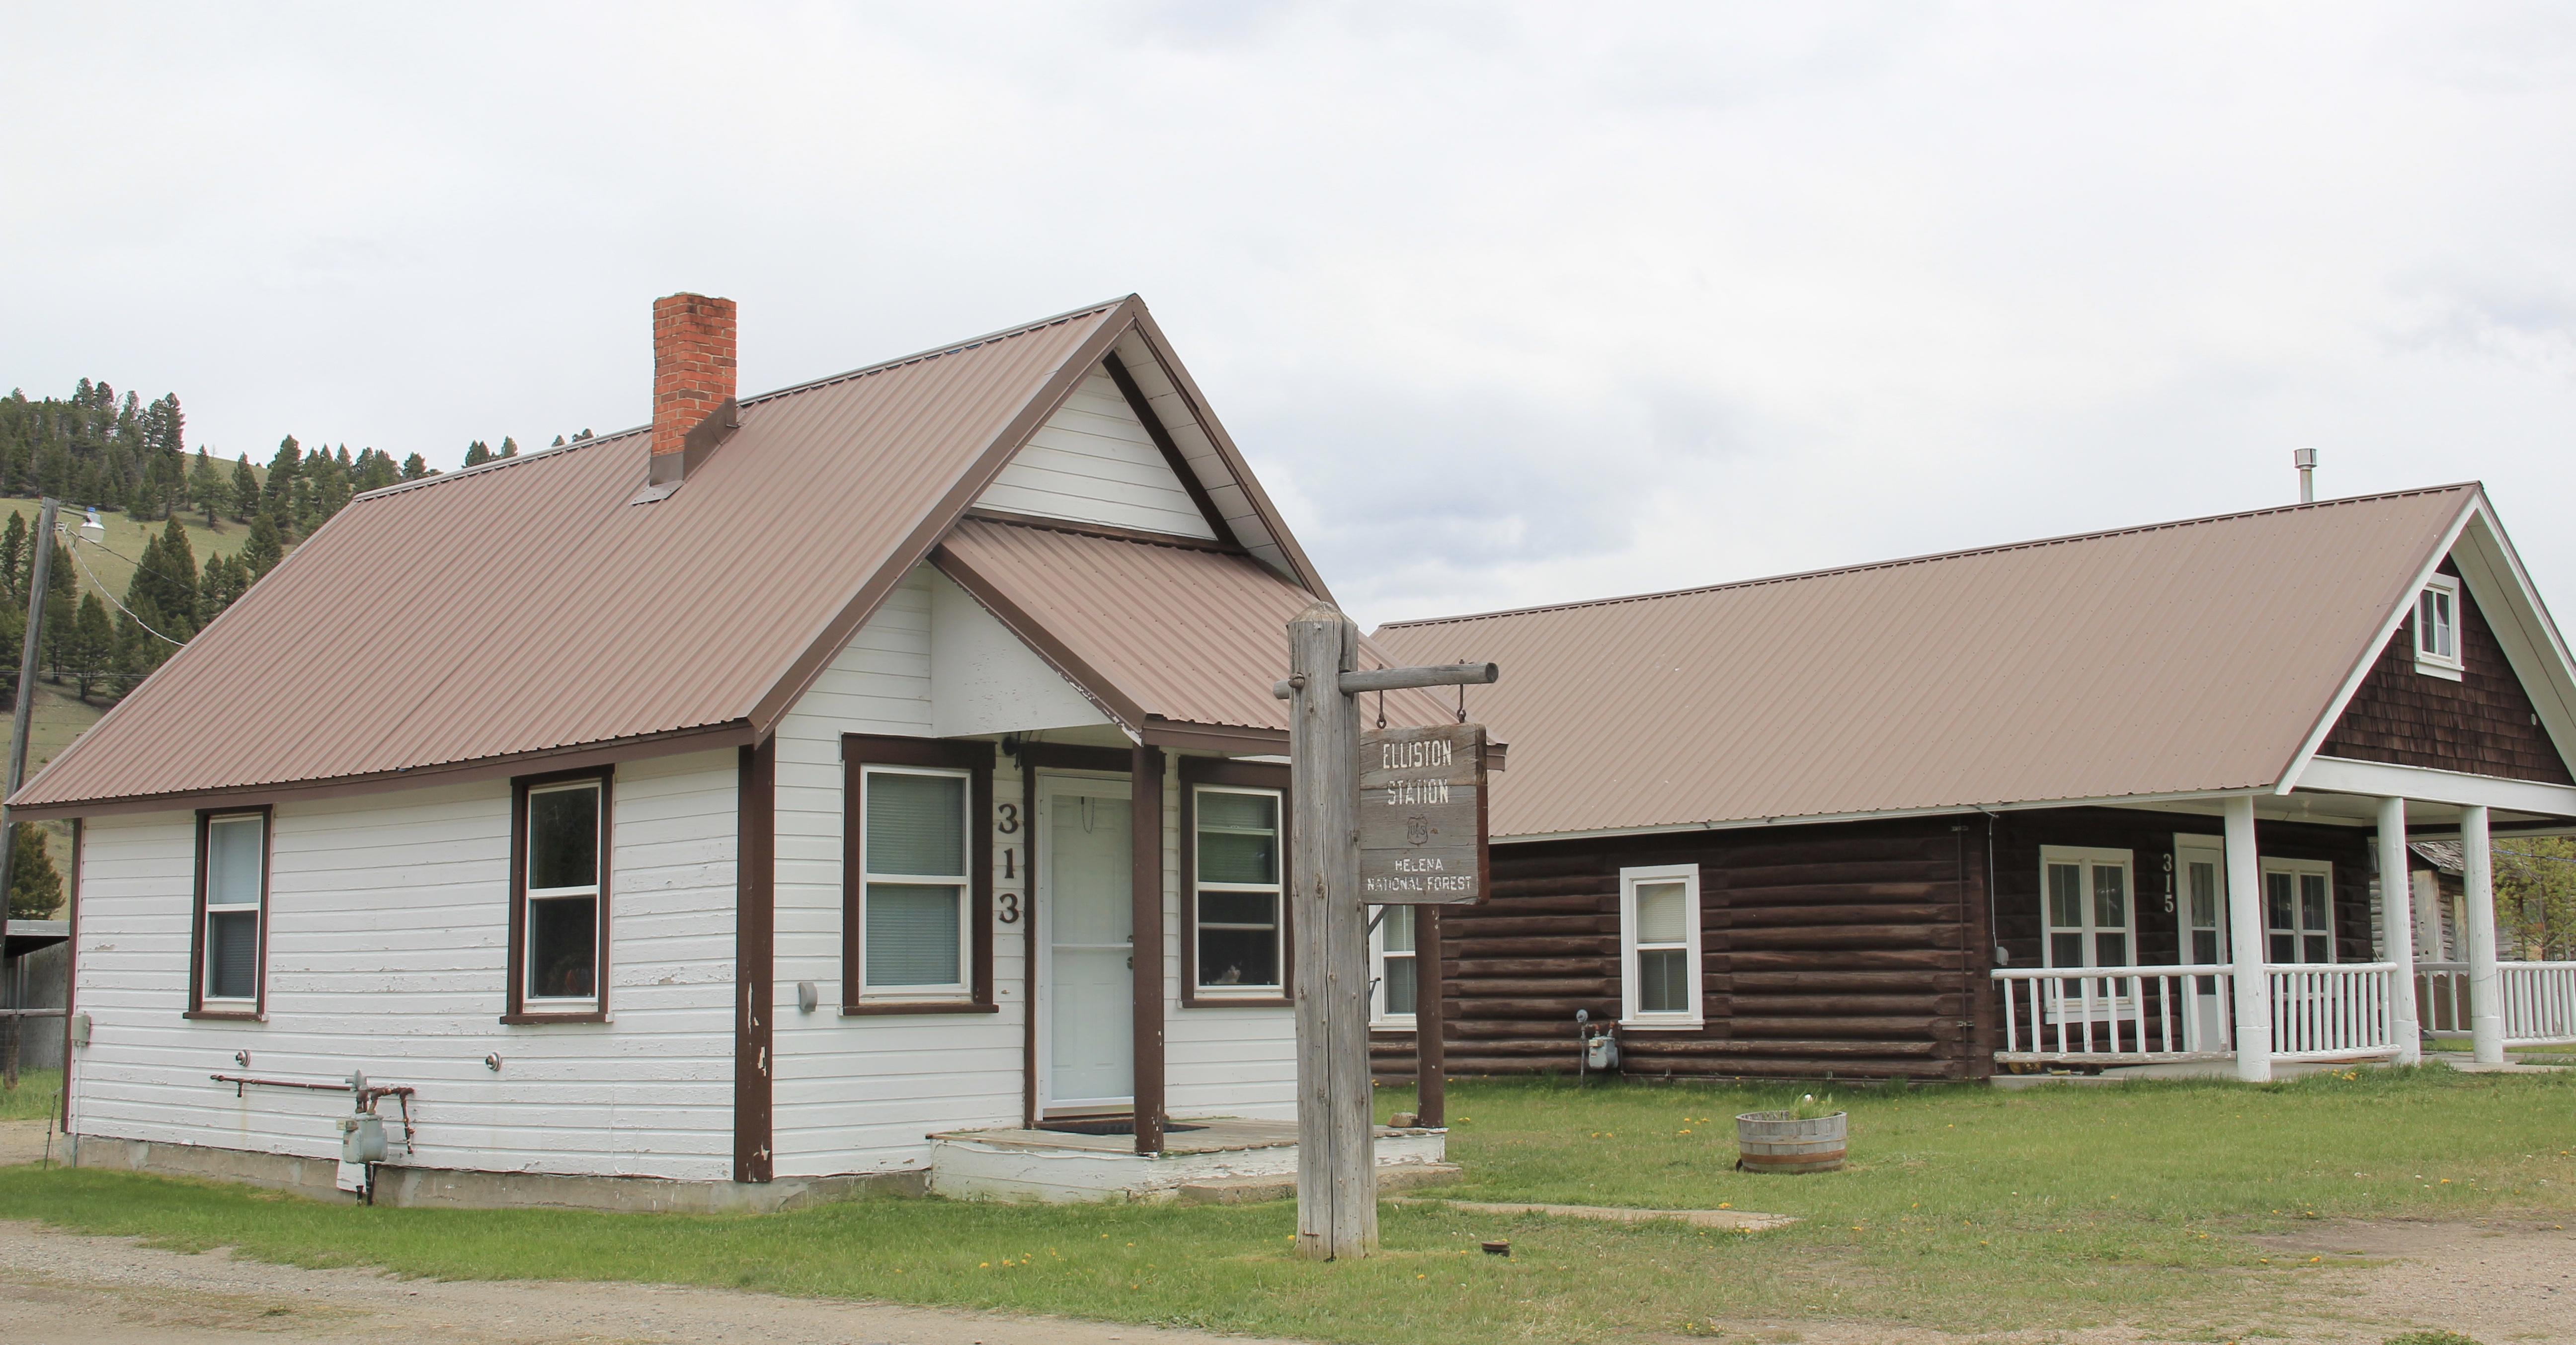 Helena National Forest ranger station, Elliston